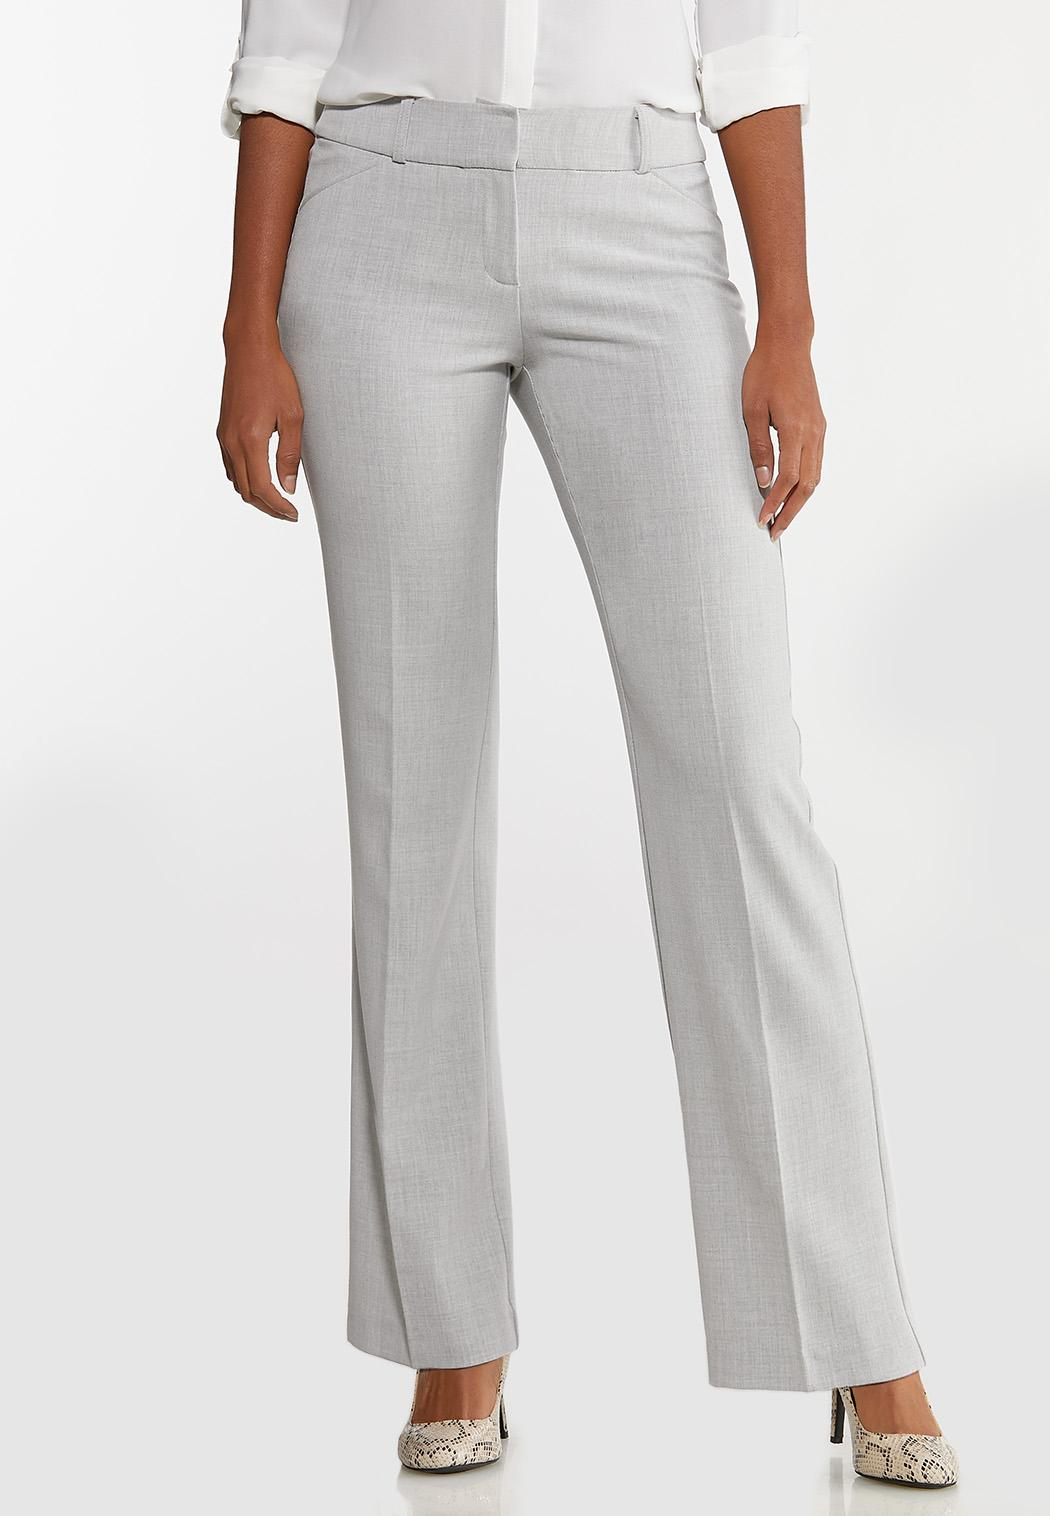 Petite Gray Trouser Pants